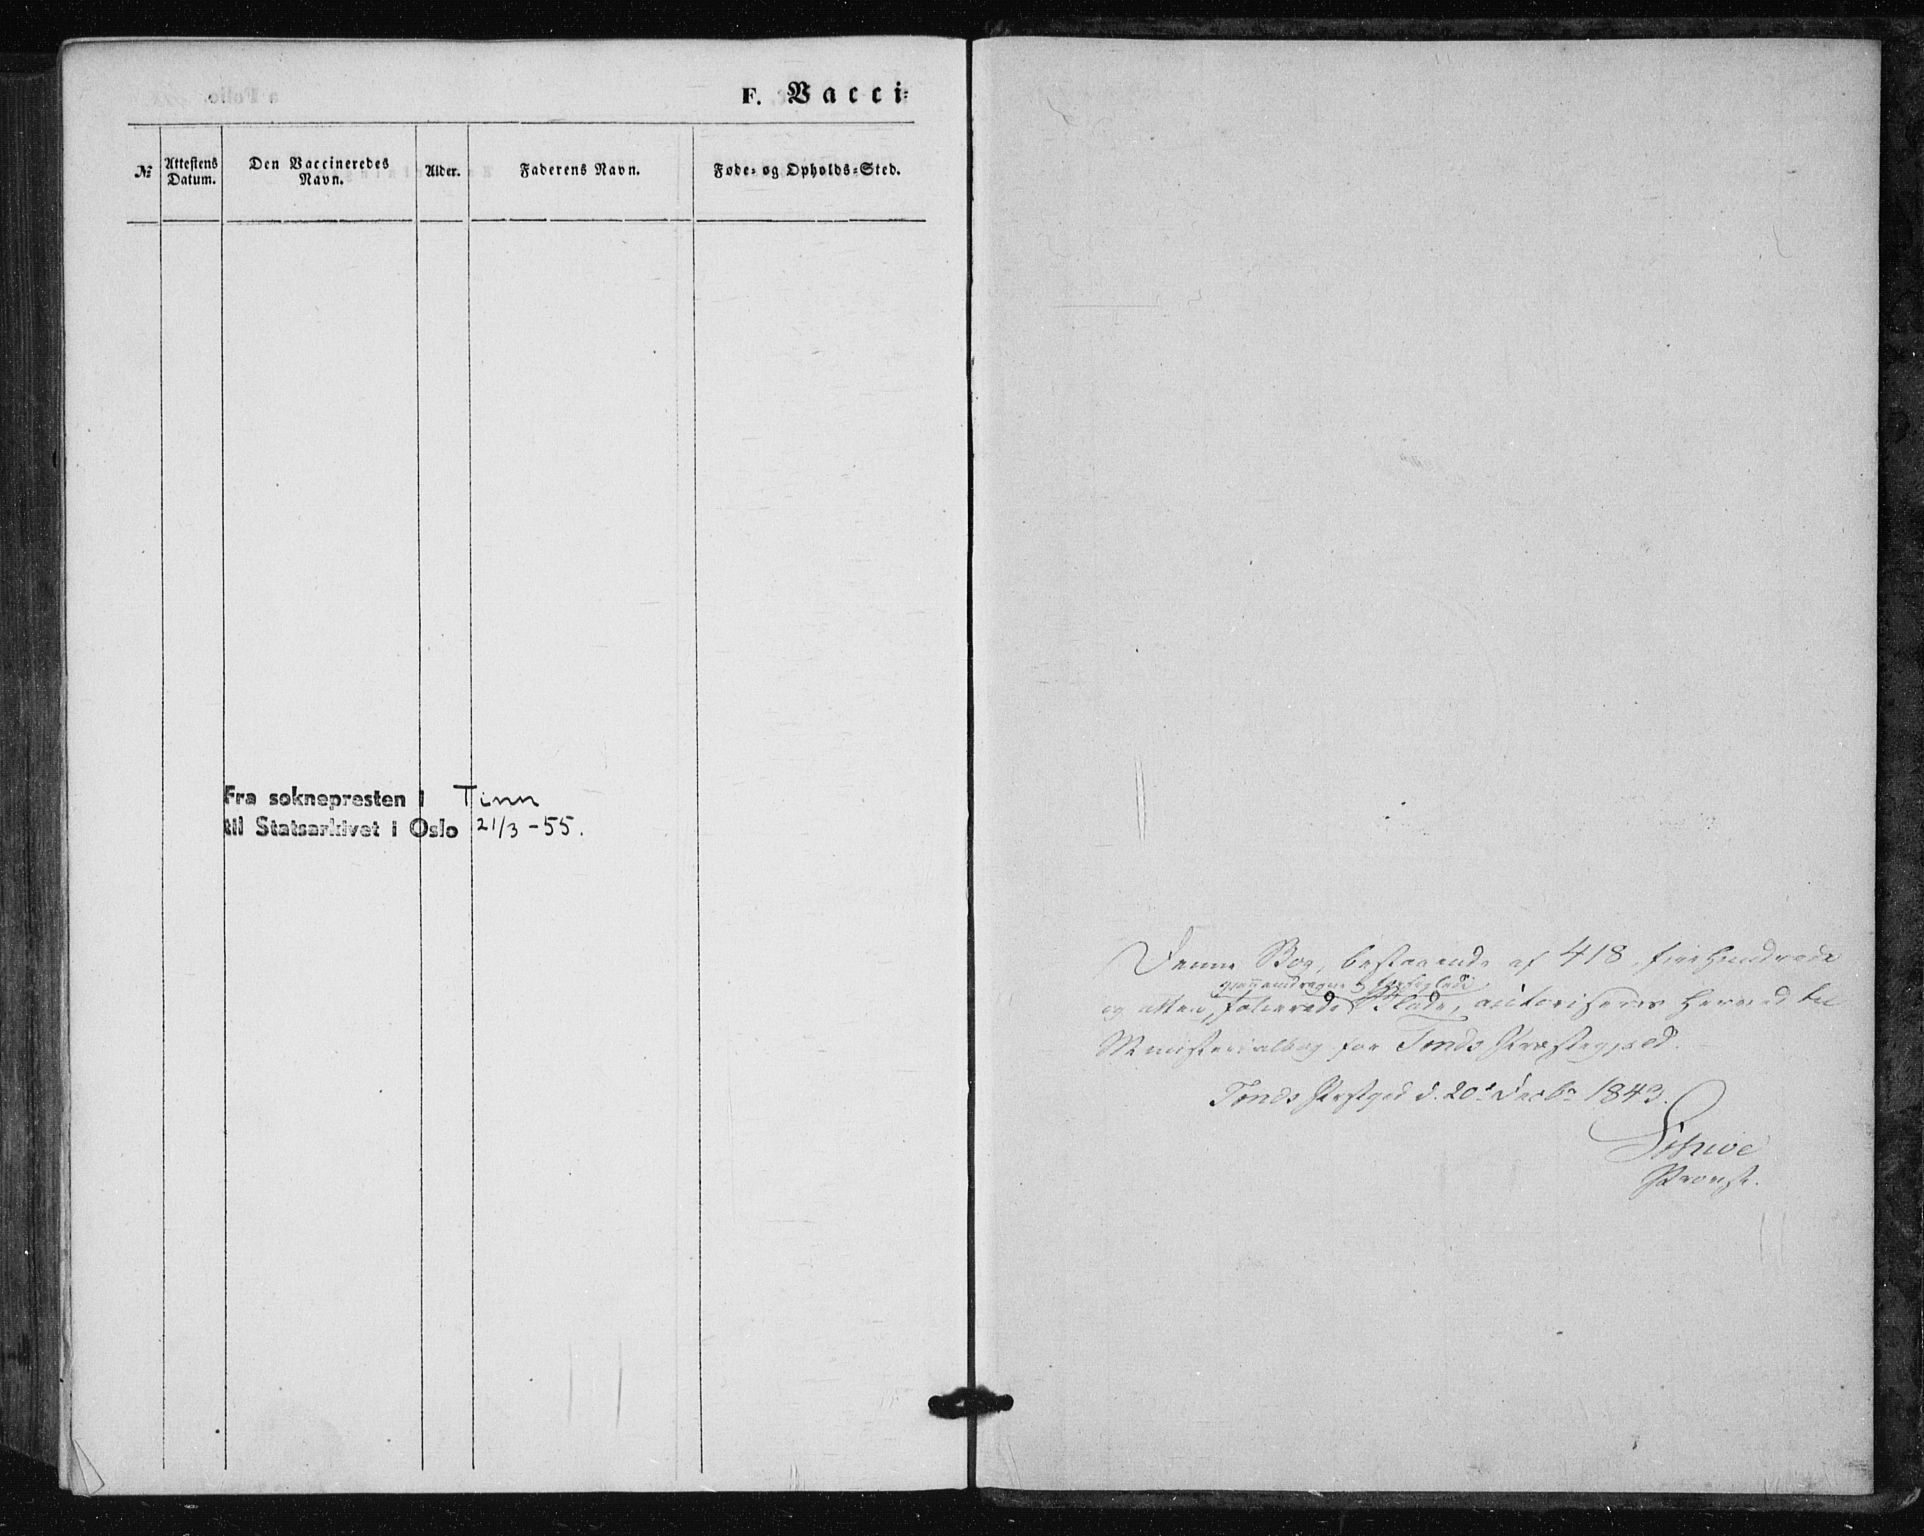 SAKO, Tinn kirkebøker, F/Fa/L0005: Ministerialbok nr. I 5, 1844-1856